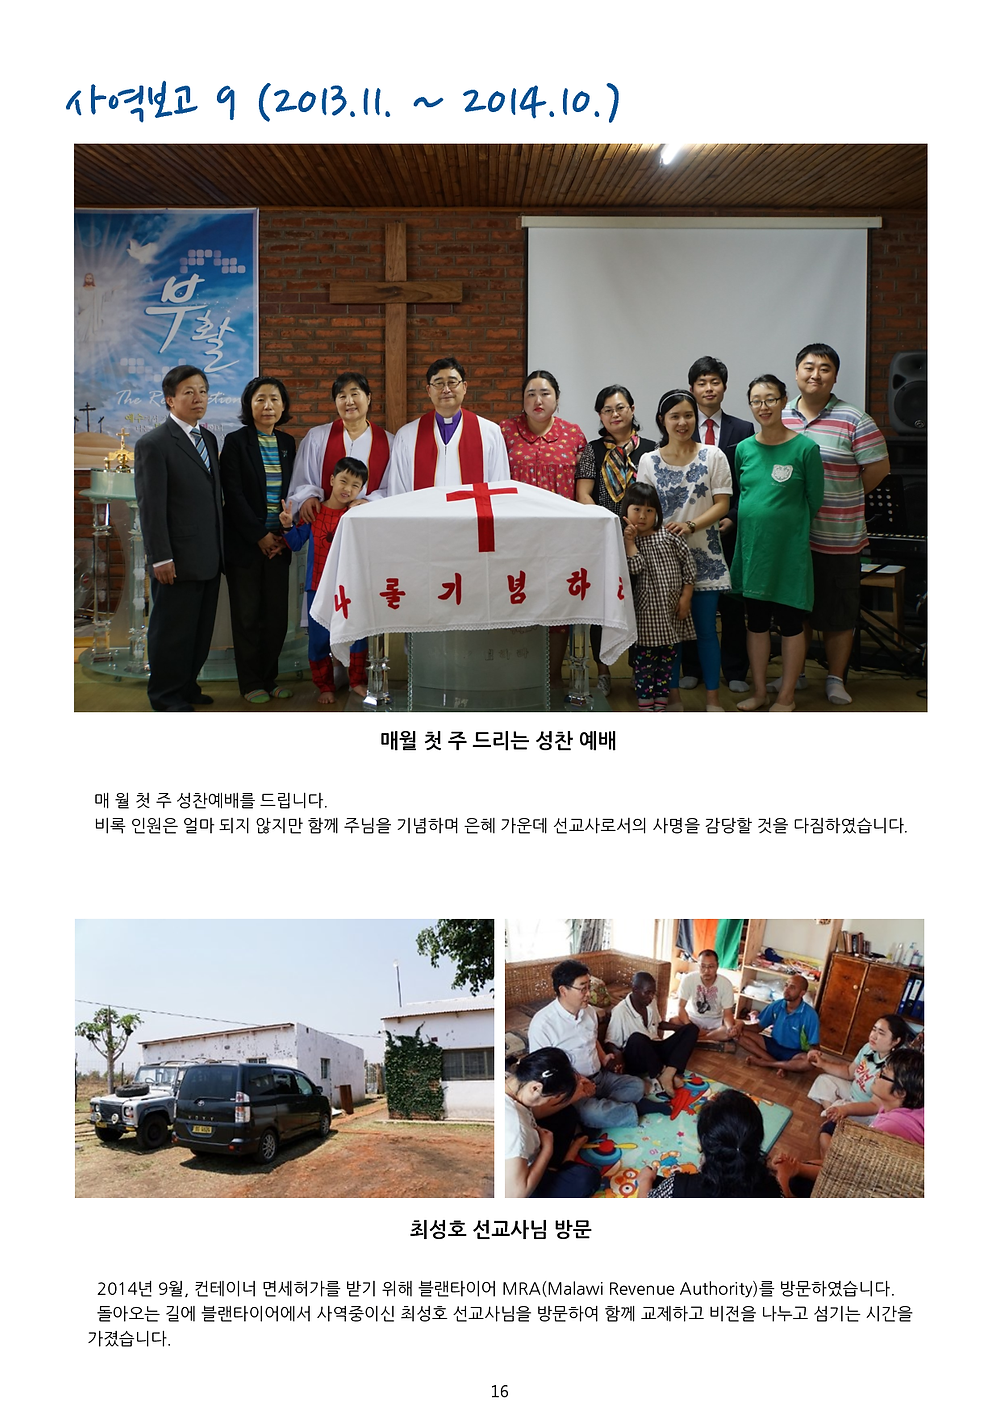 NWM 2014년 선교보고_16.png